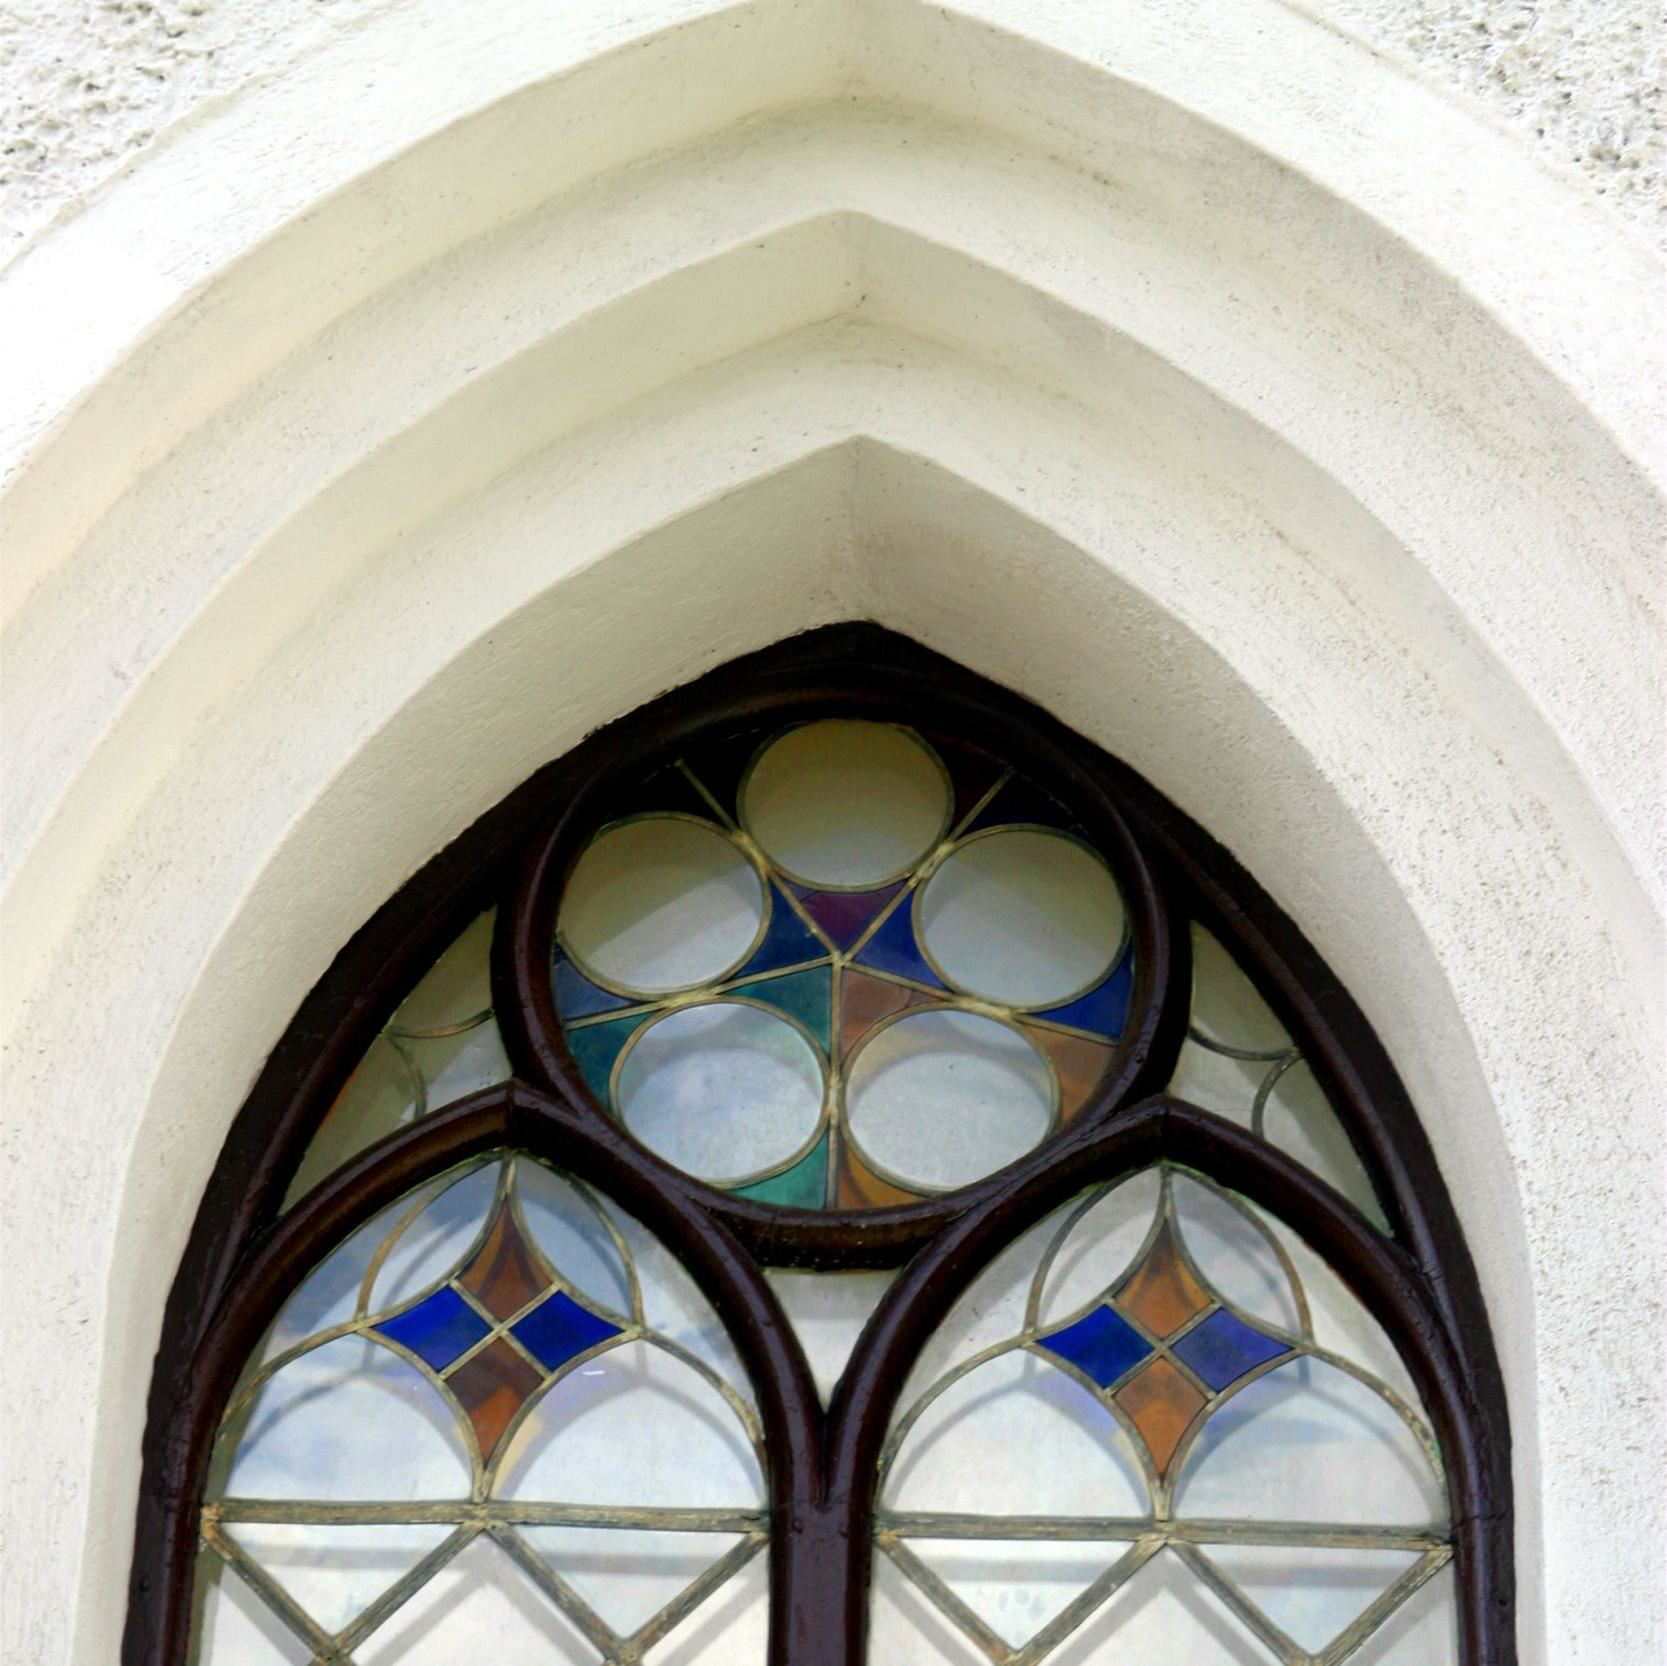 © Kävlinge kommun, Virke church